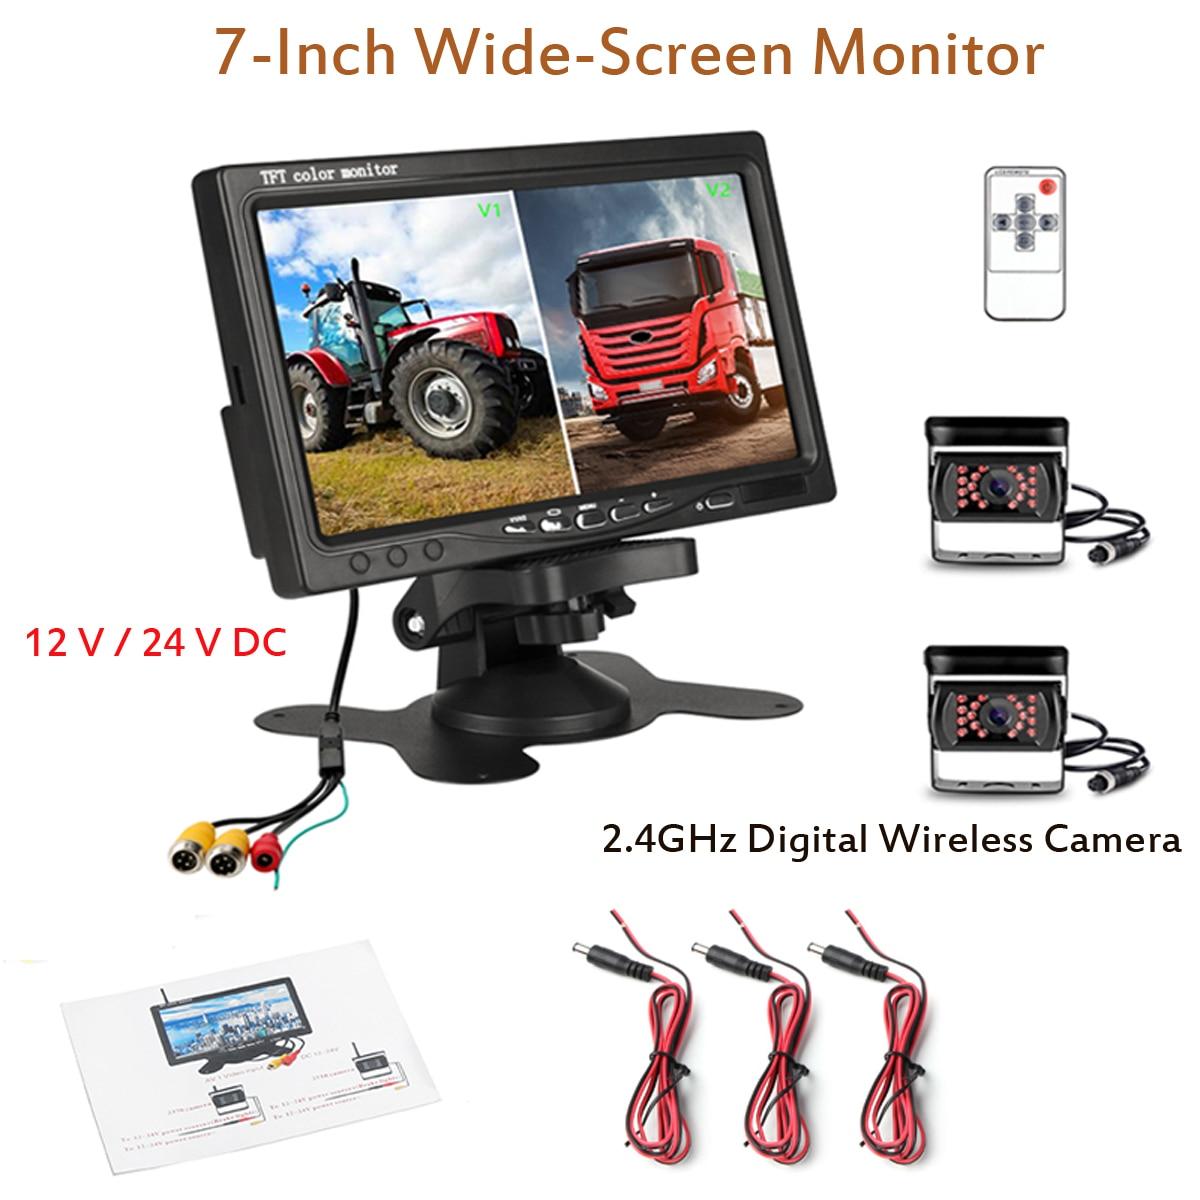 Get 12V 24V 7″ Wireless Monitor Reversing Camera Rear View Kit Fit for Truck CARAVAN Boat